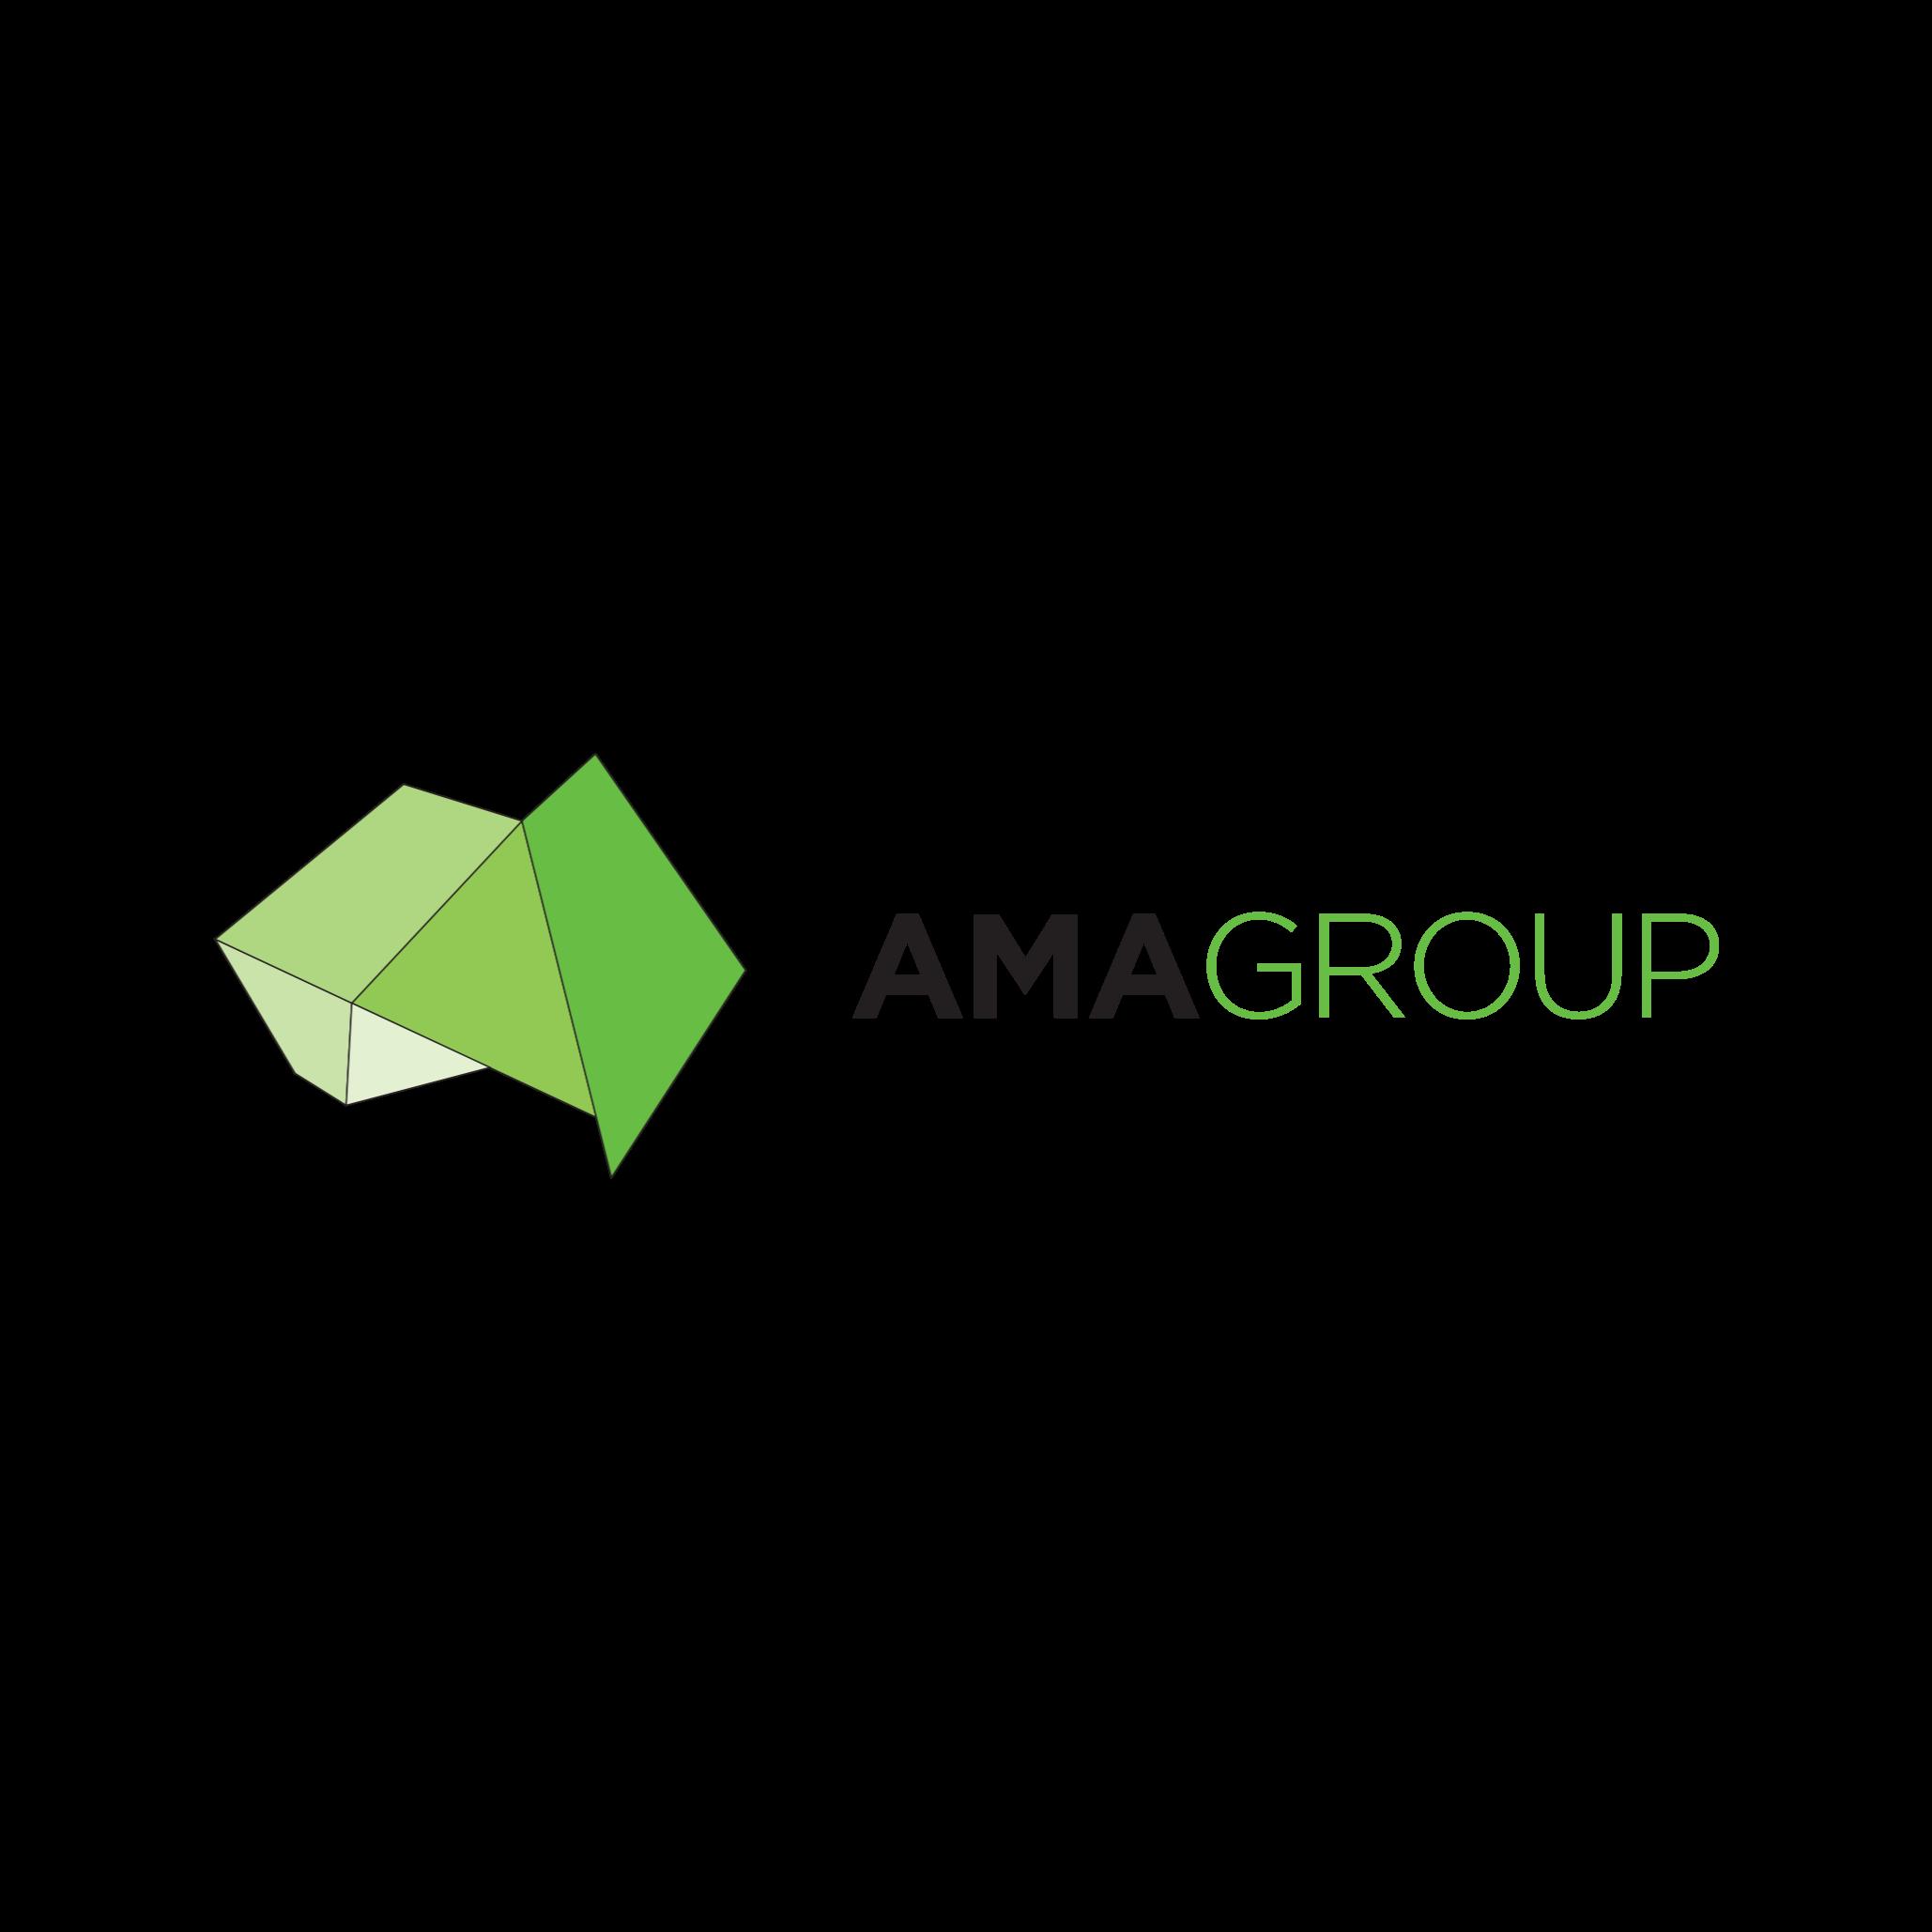 ASX:AMA logo